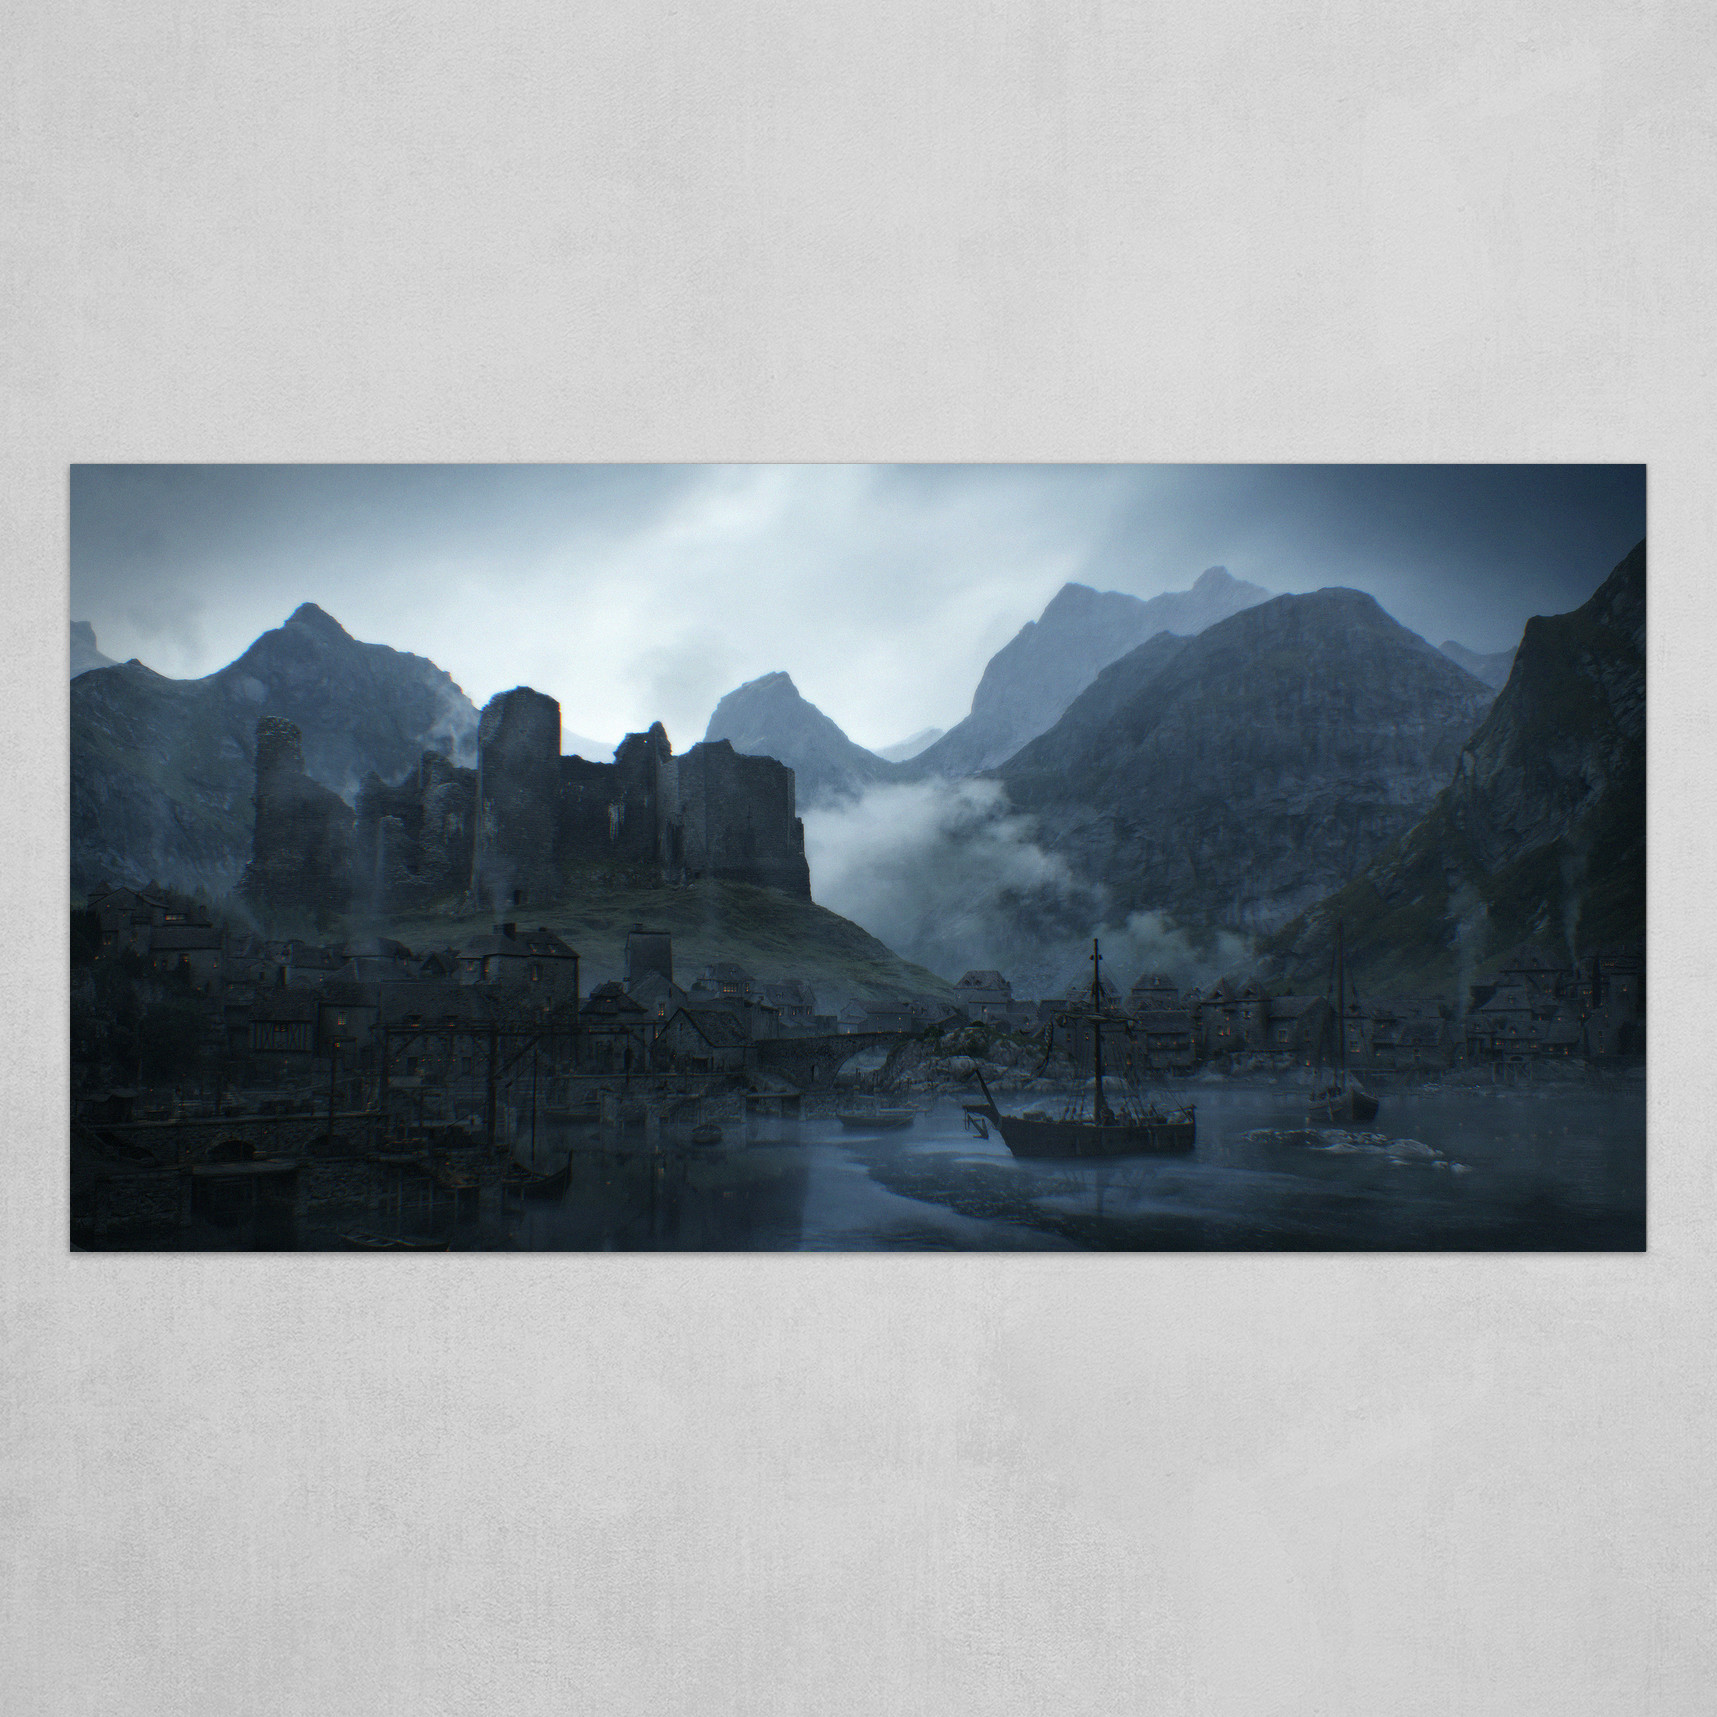 Port of Ibben: Widescreen Format